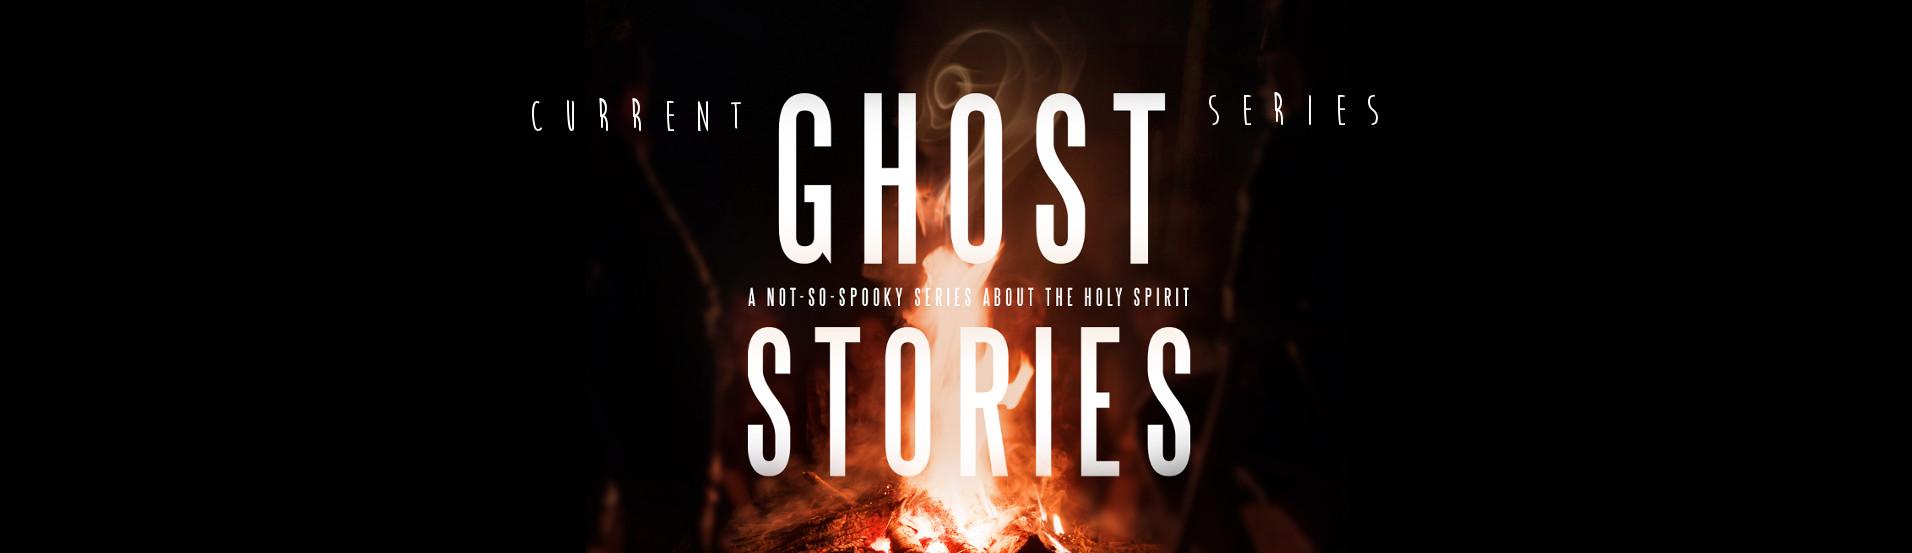 GhostStores_webbanner_current